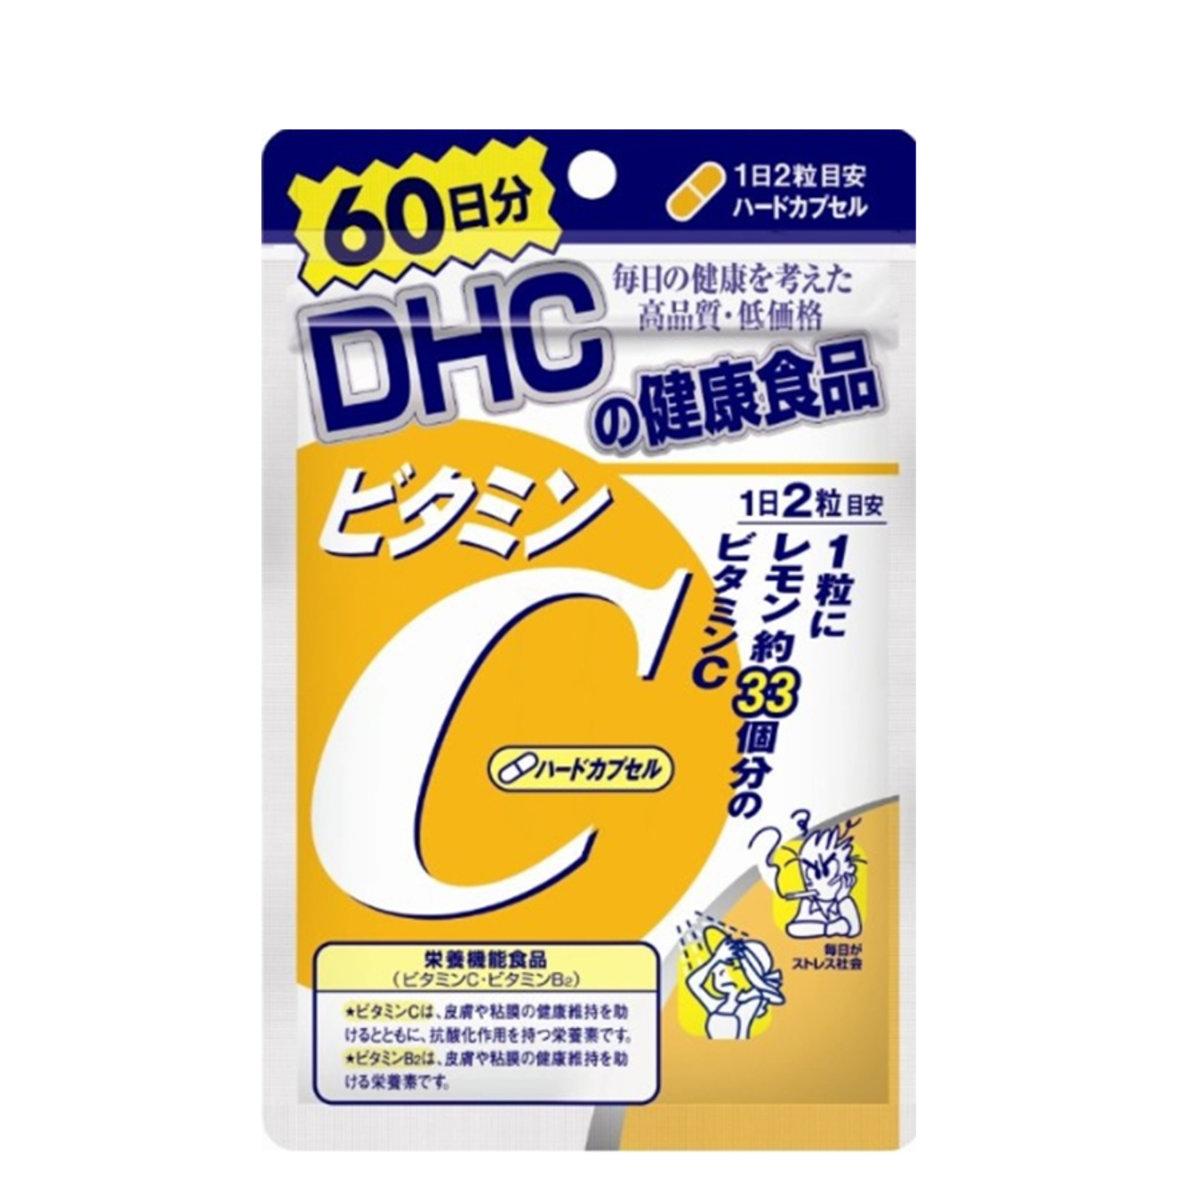 DHC維他命C(60日份) 120粒 (平行進口)